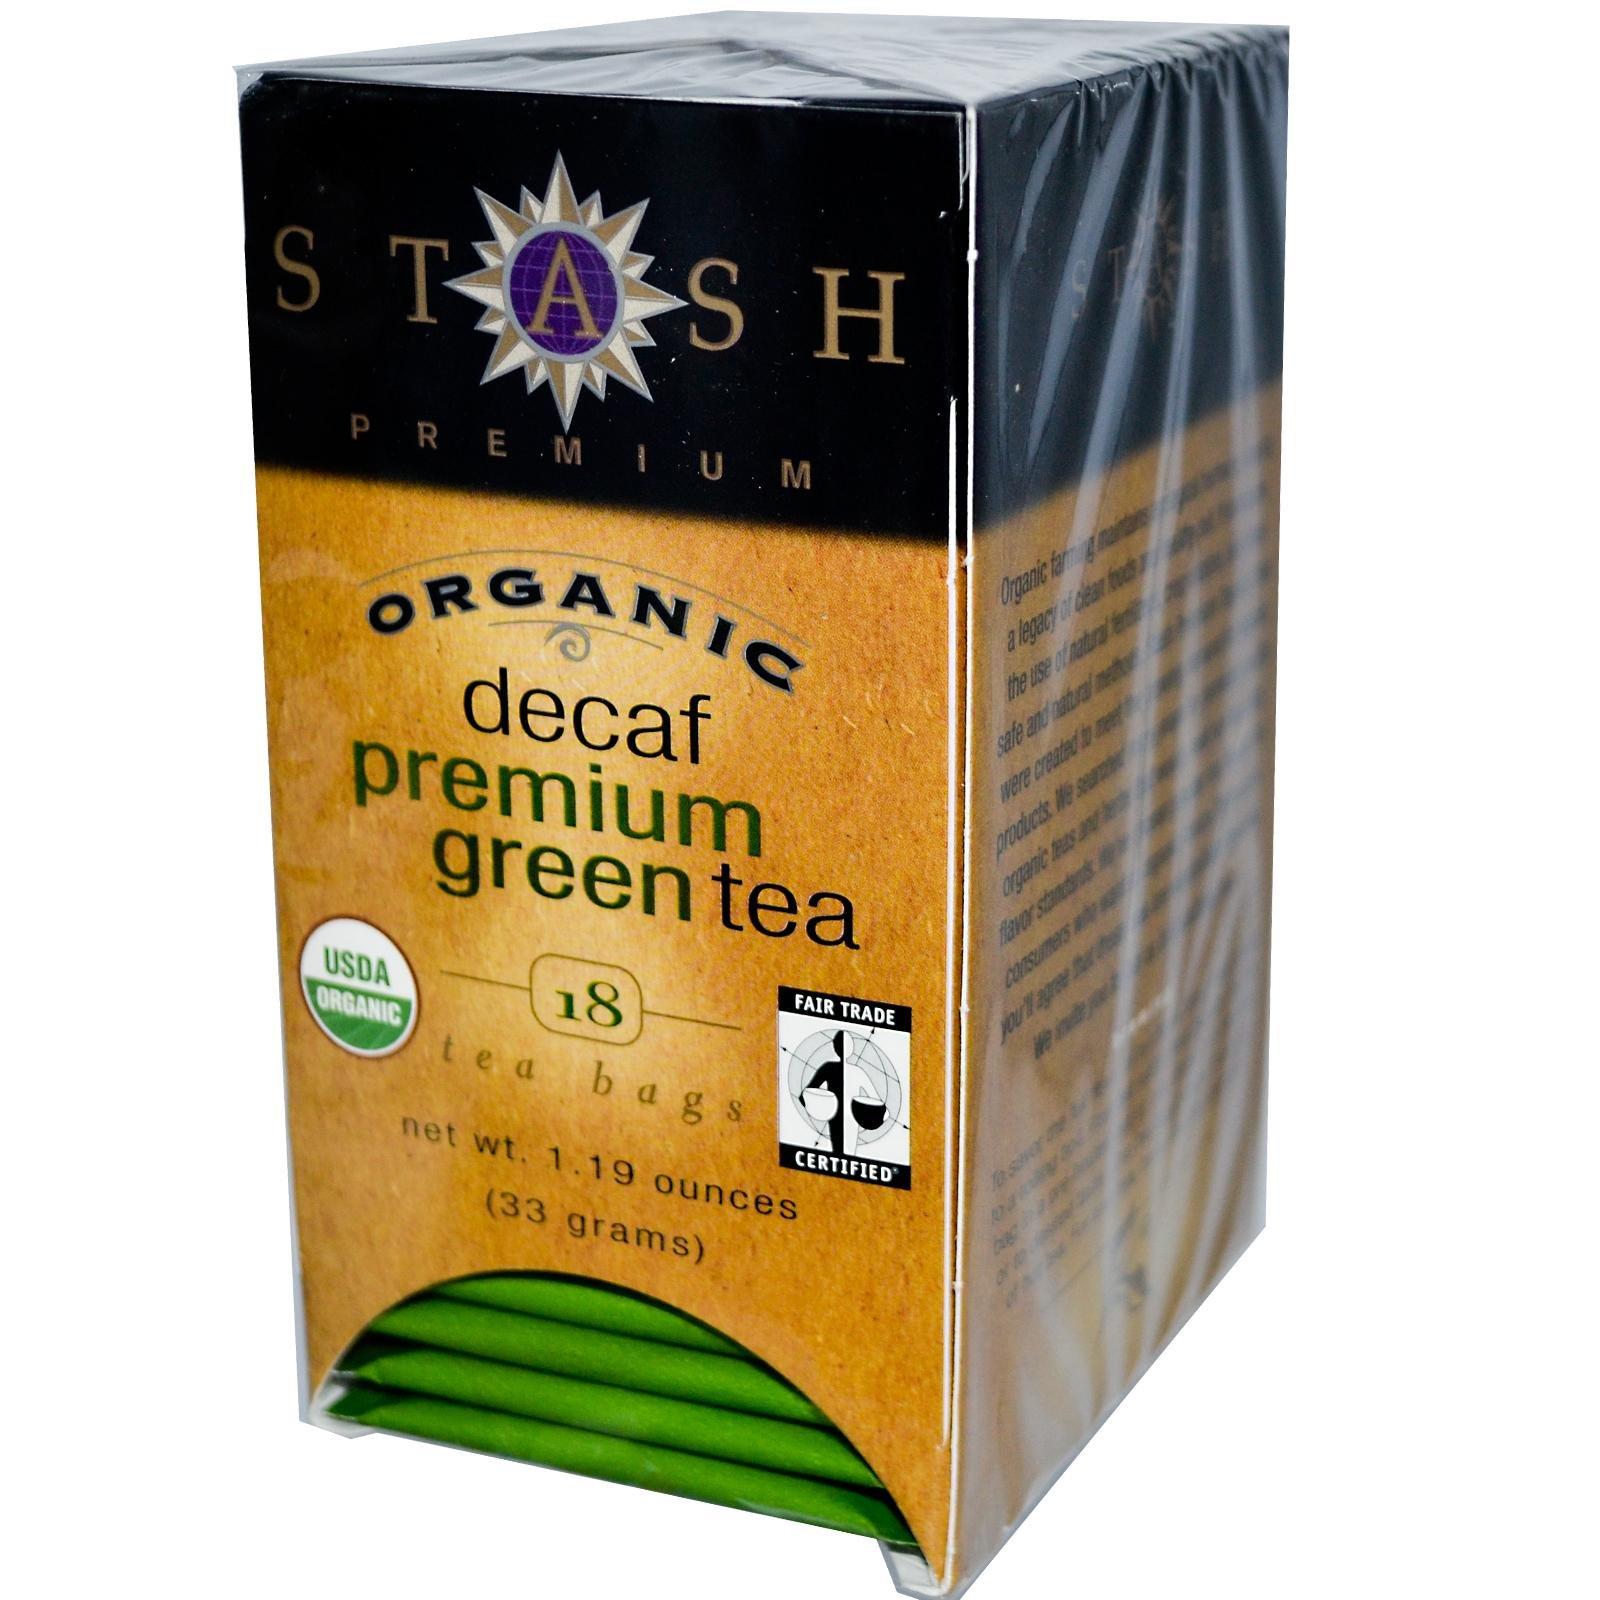 Decaffeinated Premium Green Organic Teas (18 Tea Bags)